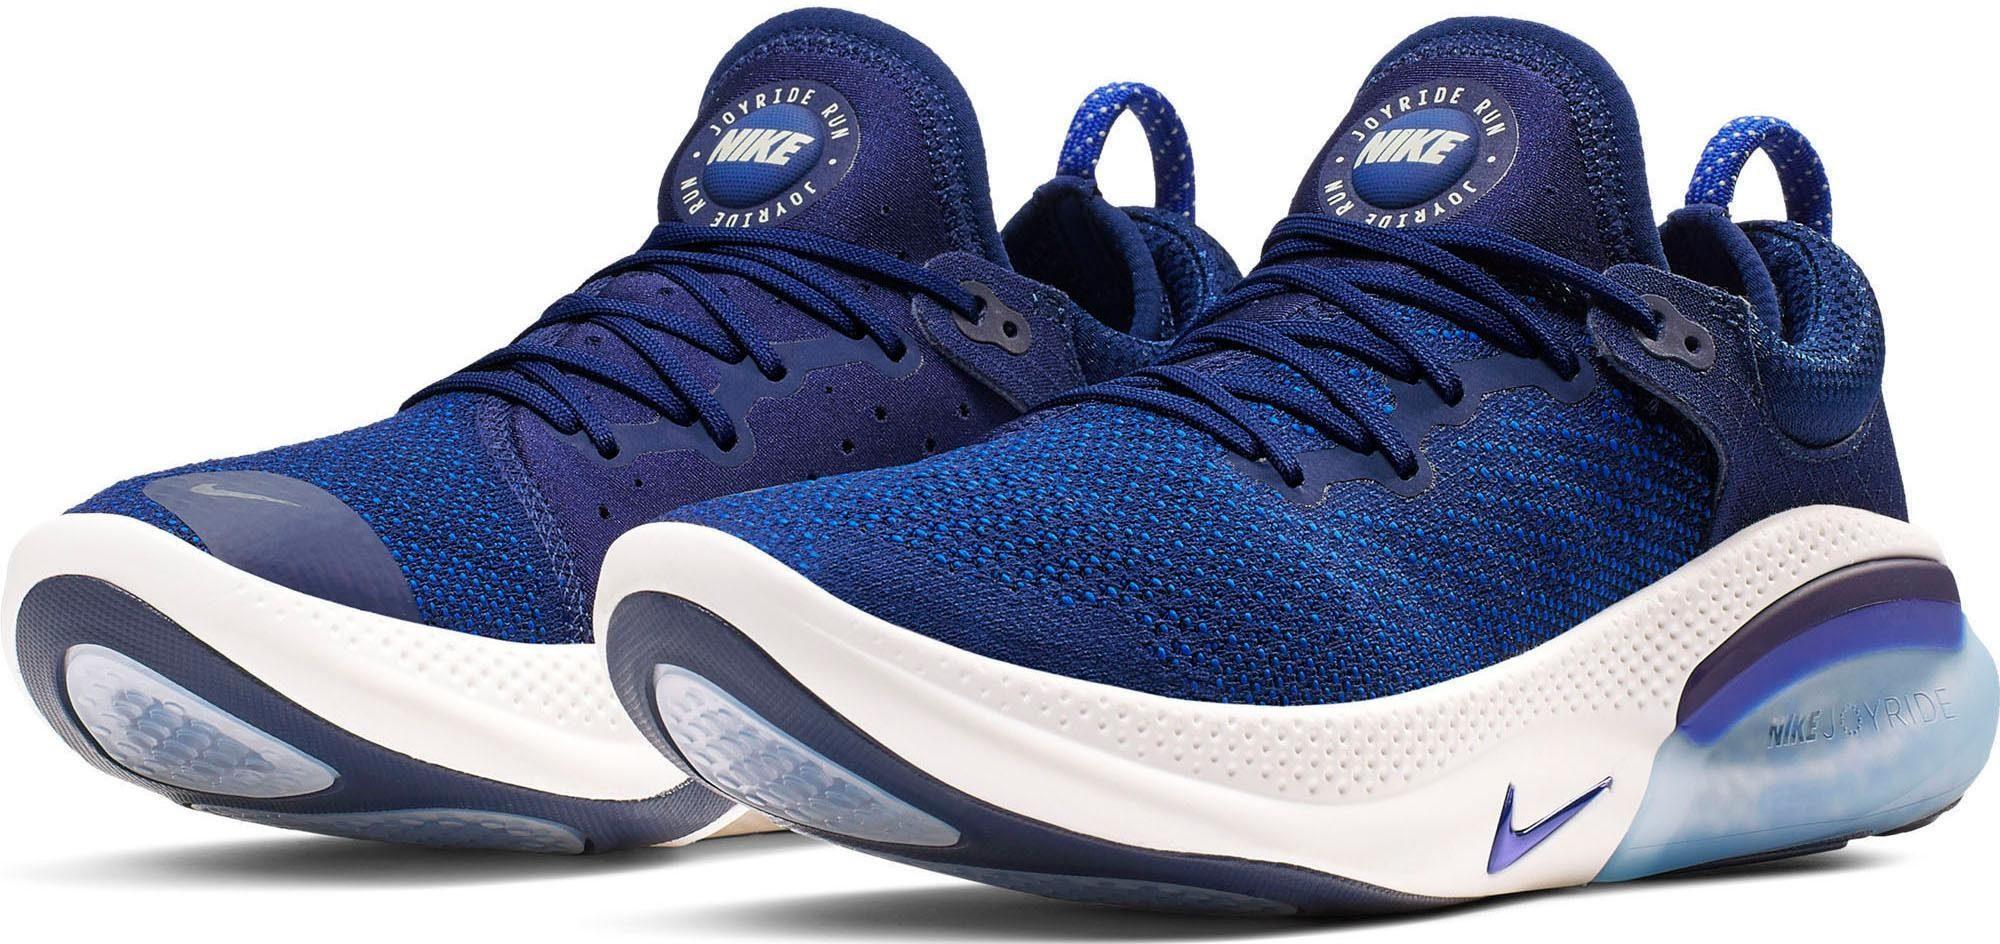 Nike »Joyride Run Flyknit« Laufschuh online kaufen | OTTO